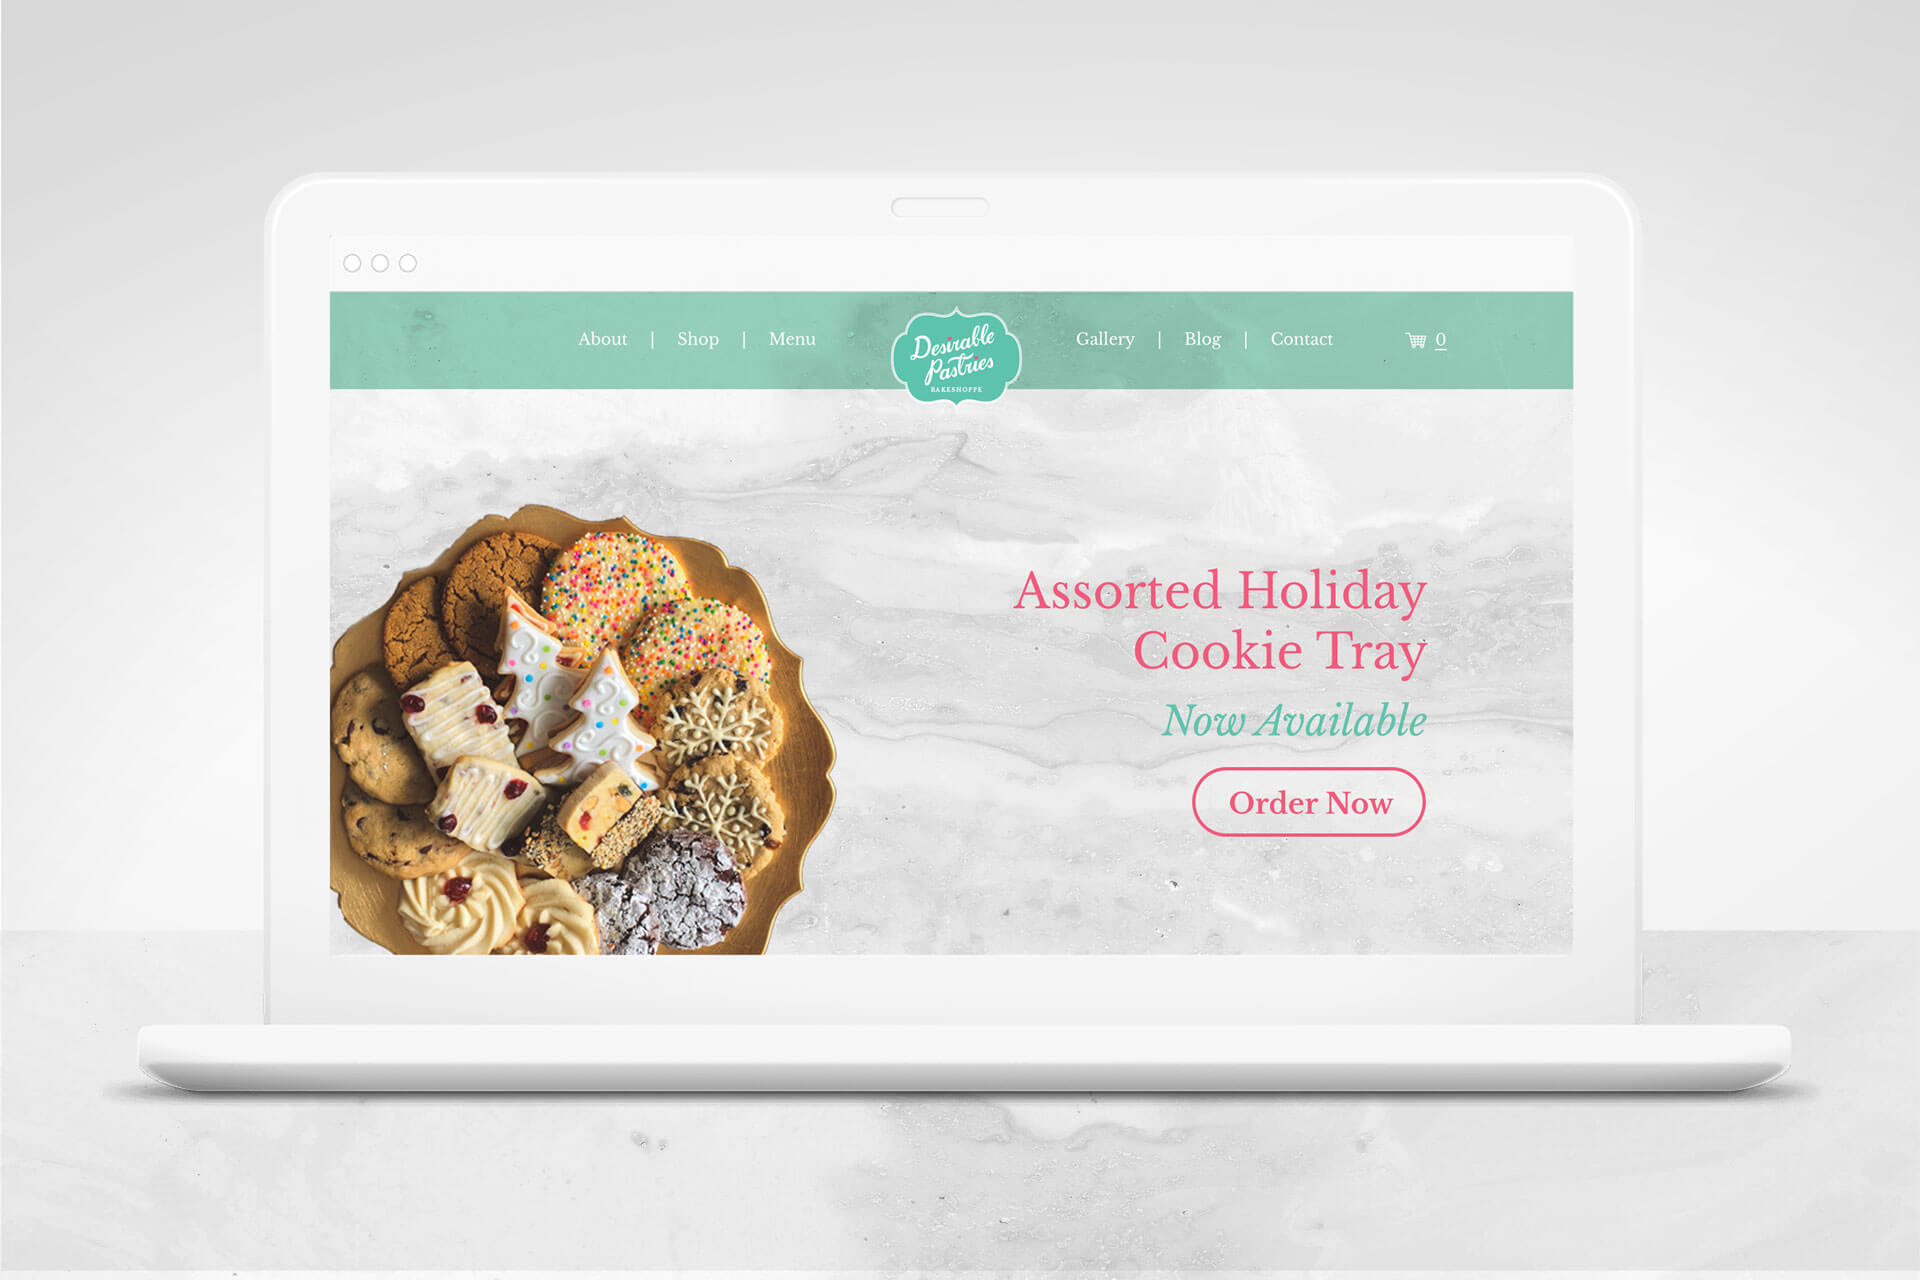 Desirable Pastries website design